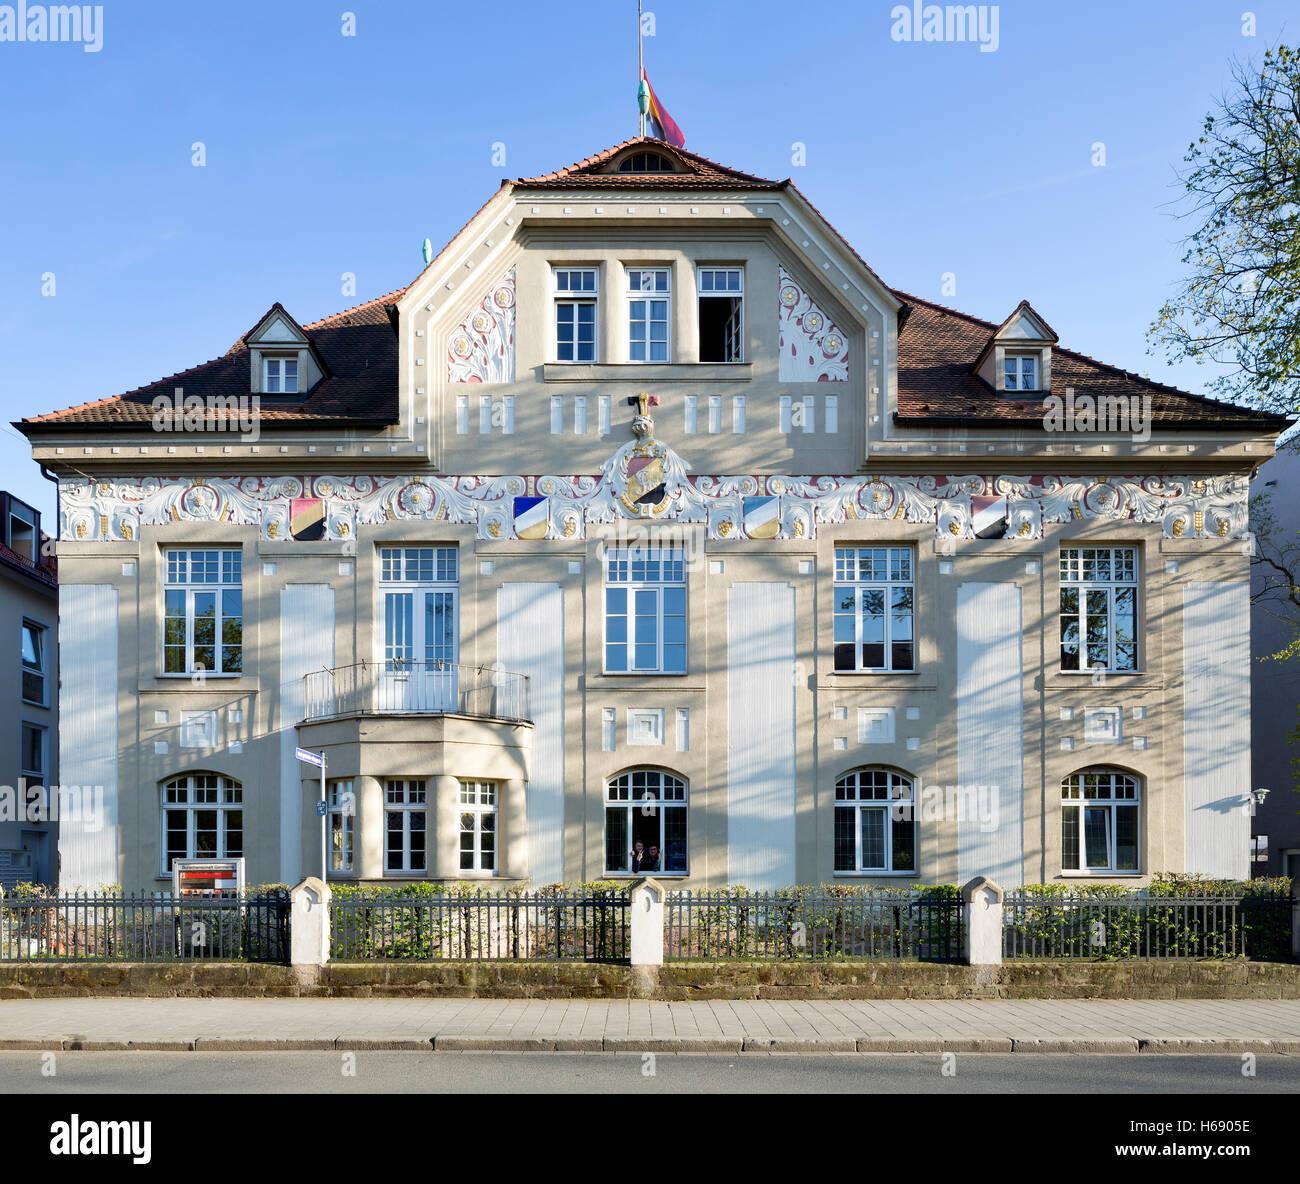 Casa di fraternità Germania o la casa tedesca, Art Nouveau, Erlangen, Media Franconia, Baviera, Germania Immagini Stock